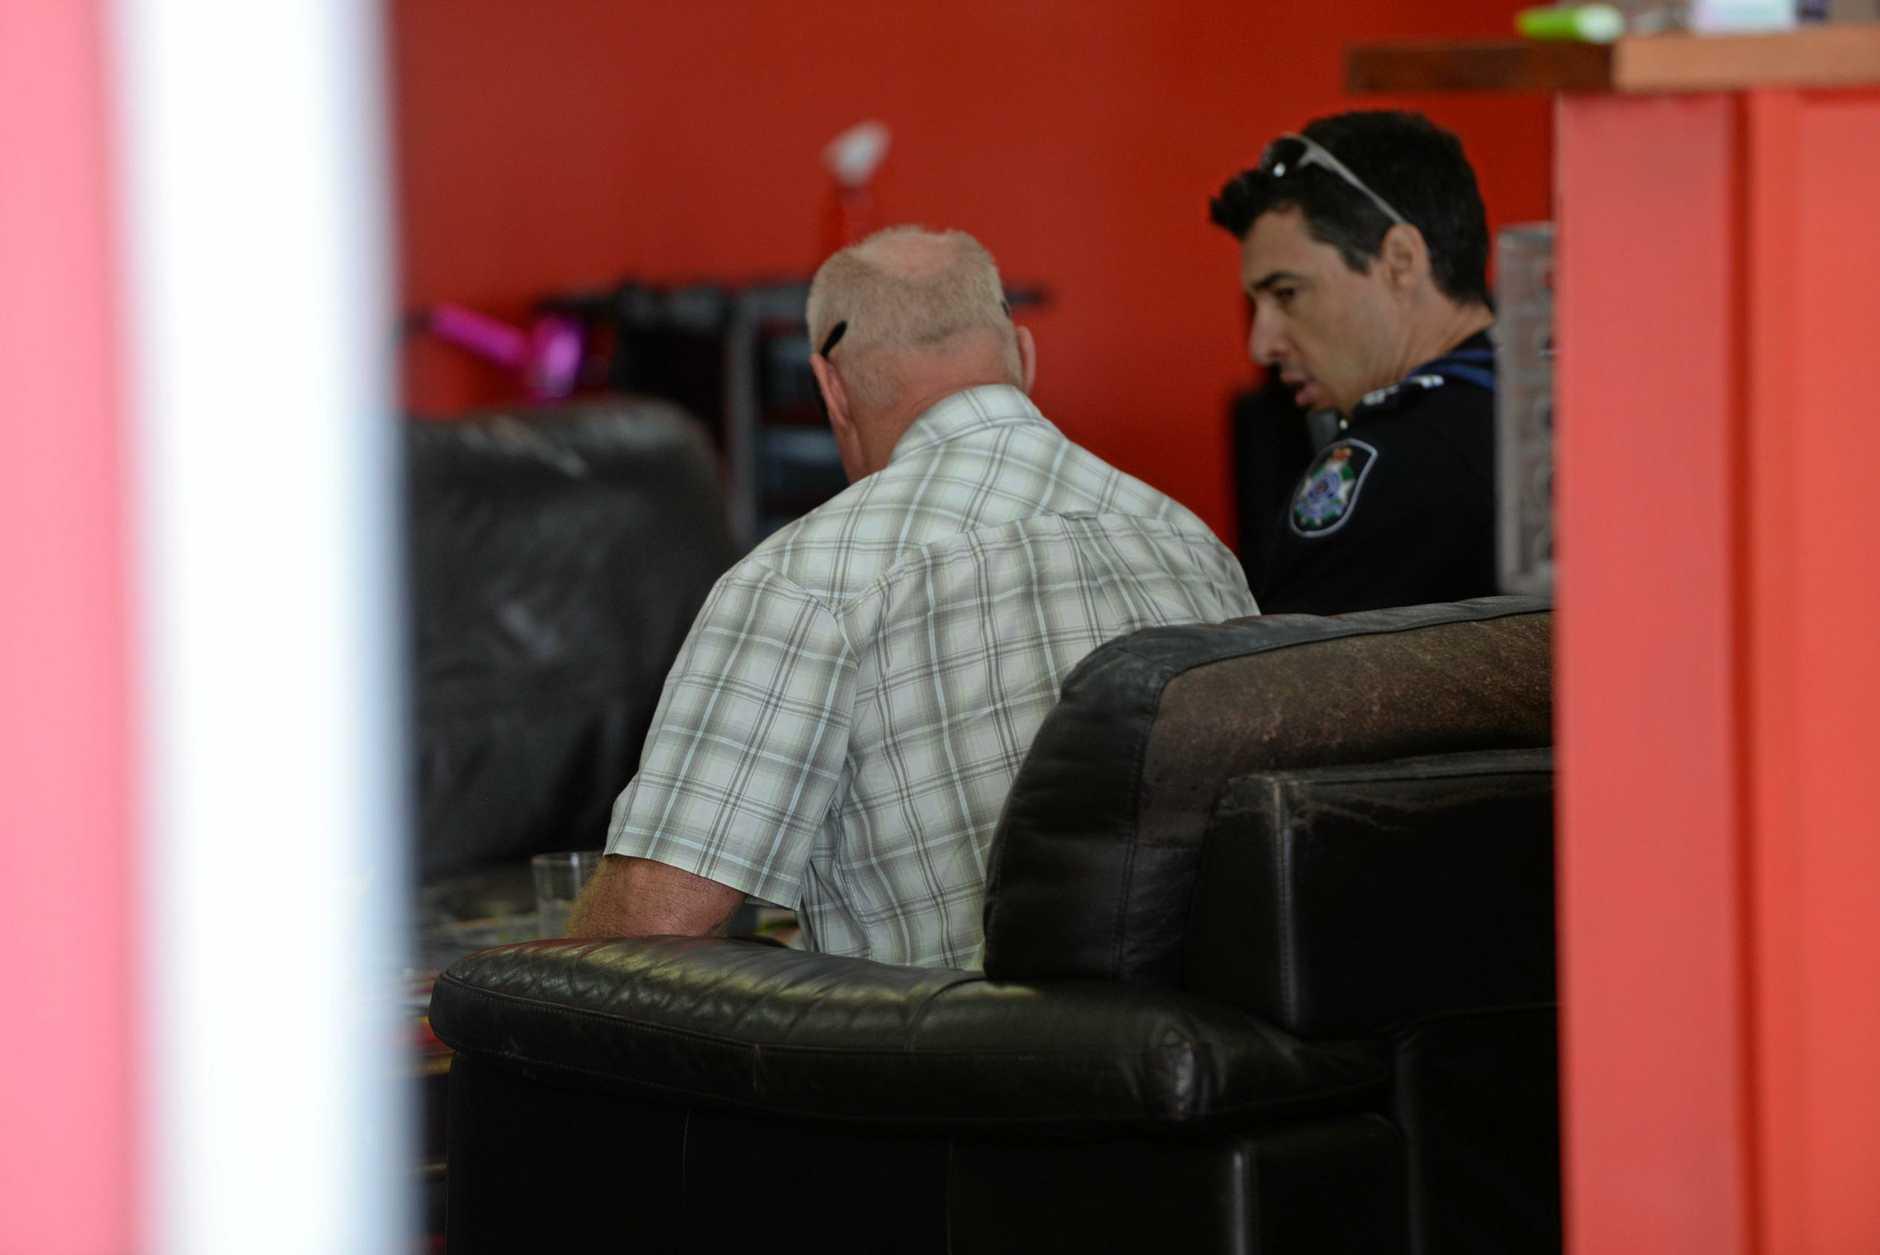 Blind Bundbaerg man Graeme Raines was assaulted on Wongarra St.